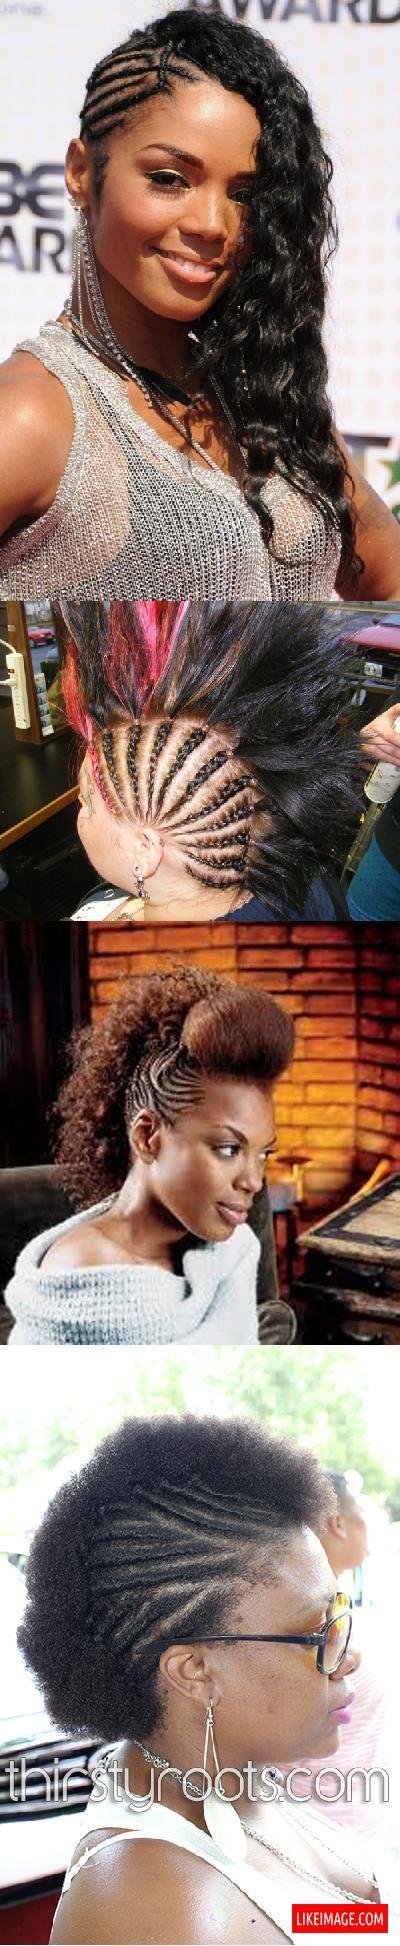 Braided mohawk hairstyles - 9 PHOTO!